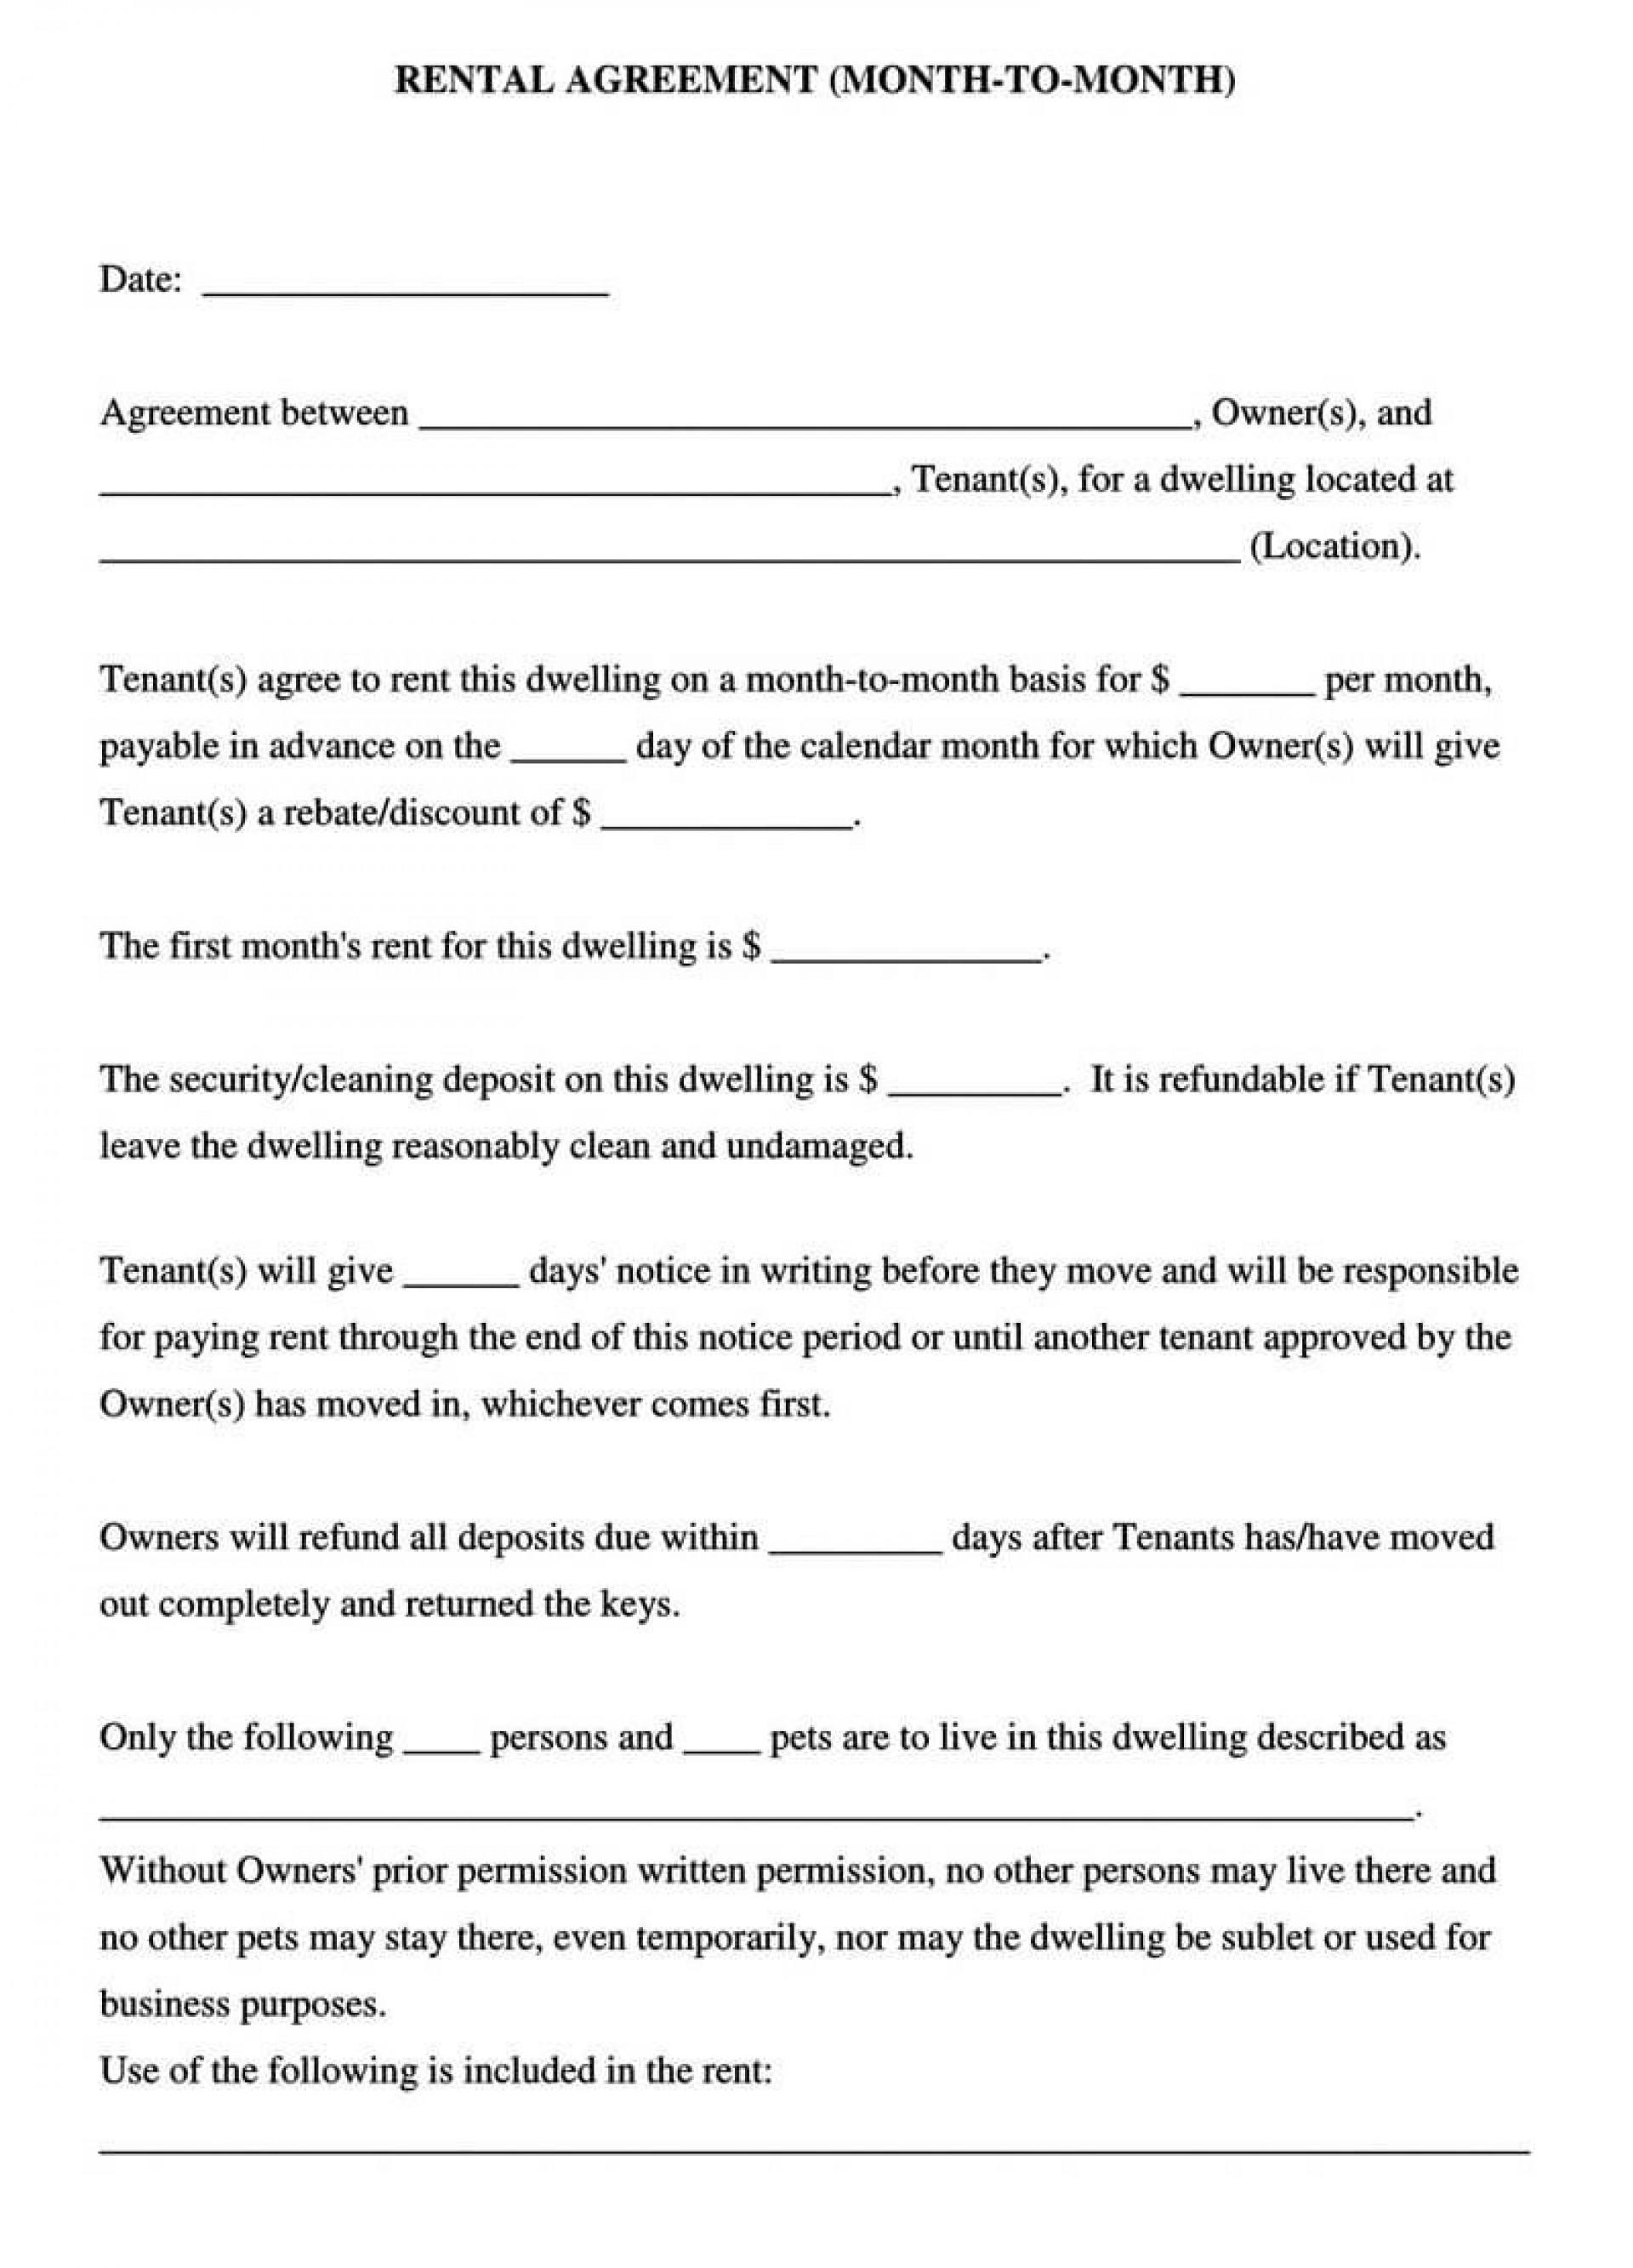 005 Rare Generic Rental Agreement Free Inspiration  Template Word Printable1920